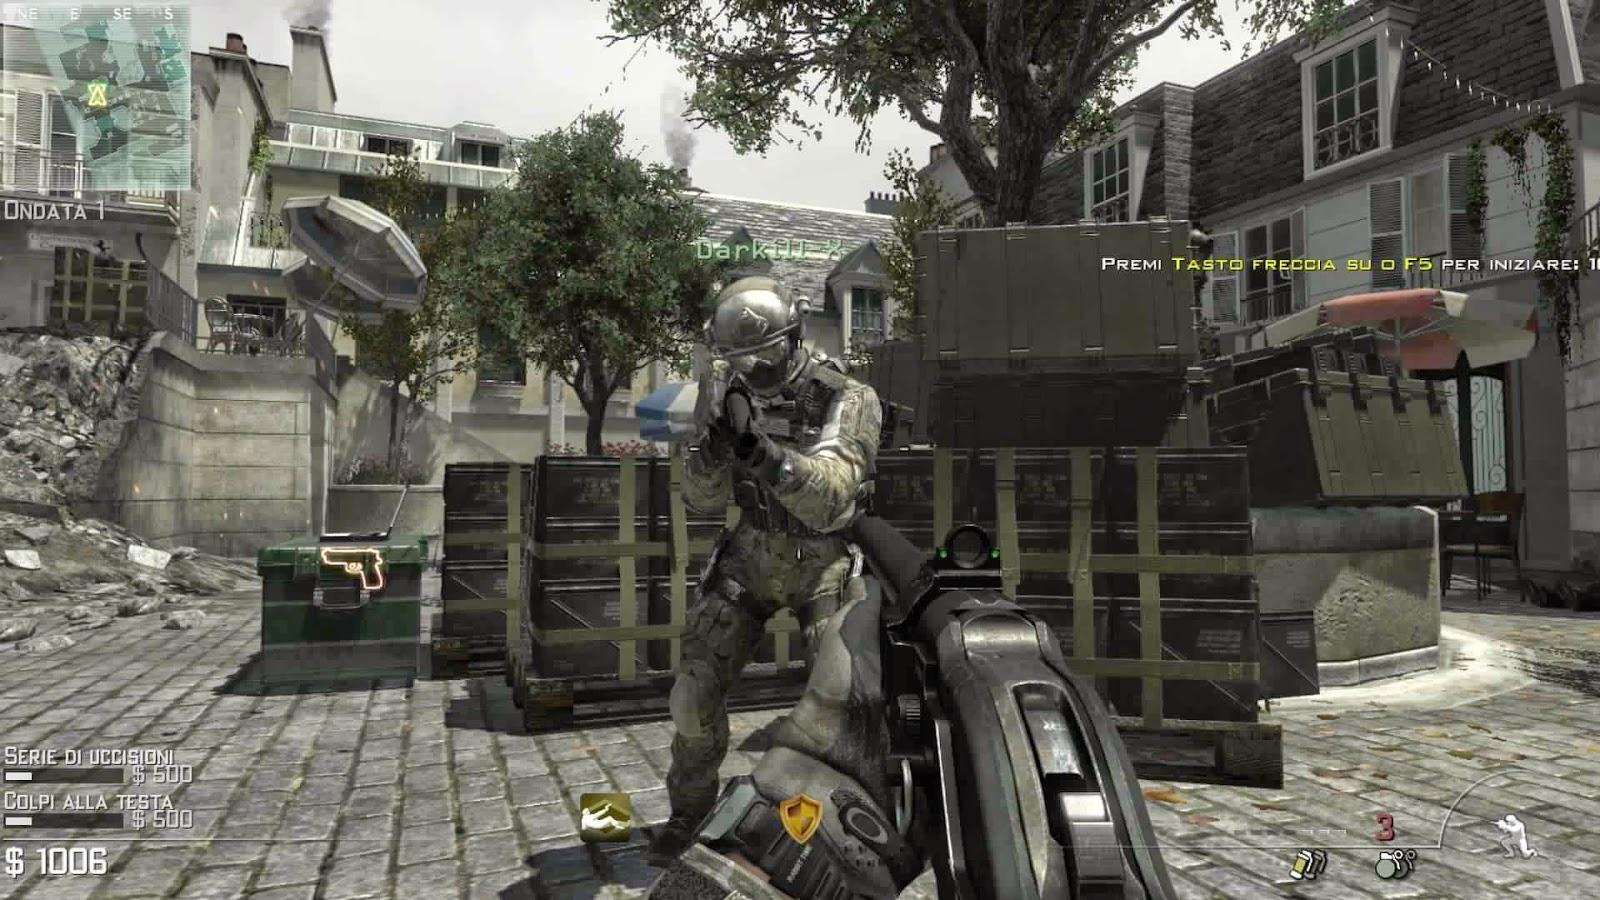 لعبة call of duty mw3 بحجم صغير